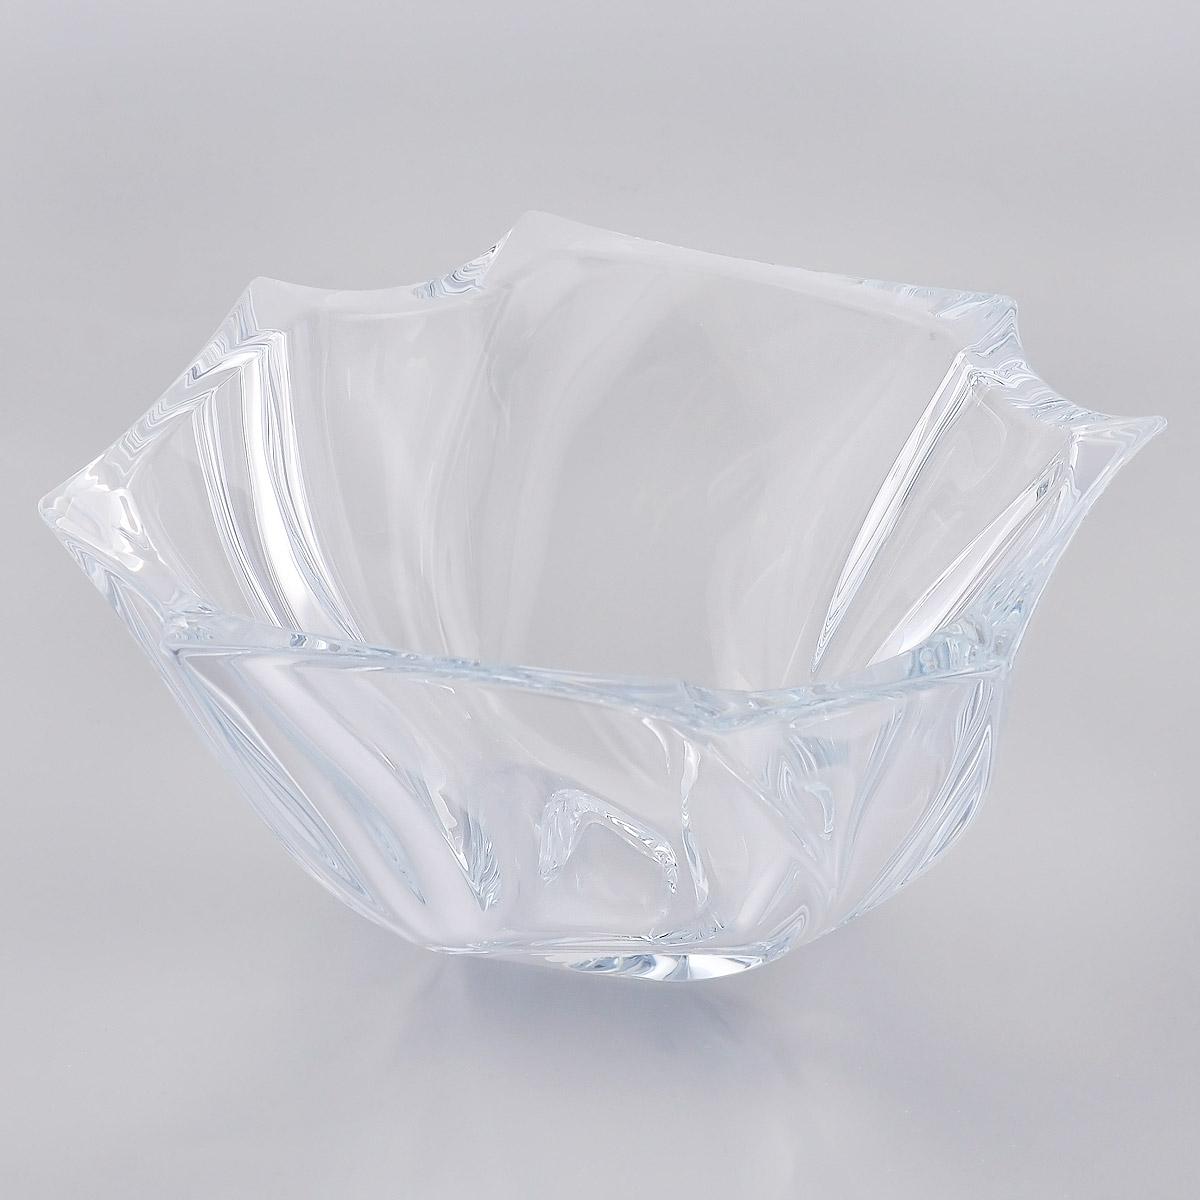 Ваза для фруктов Crystalite Bohemia Нептун, 25,5 см х 26 см х 12,5 см ваза d16 5 см х h24 см